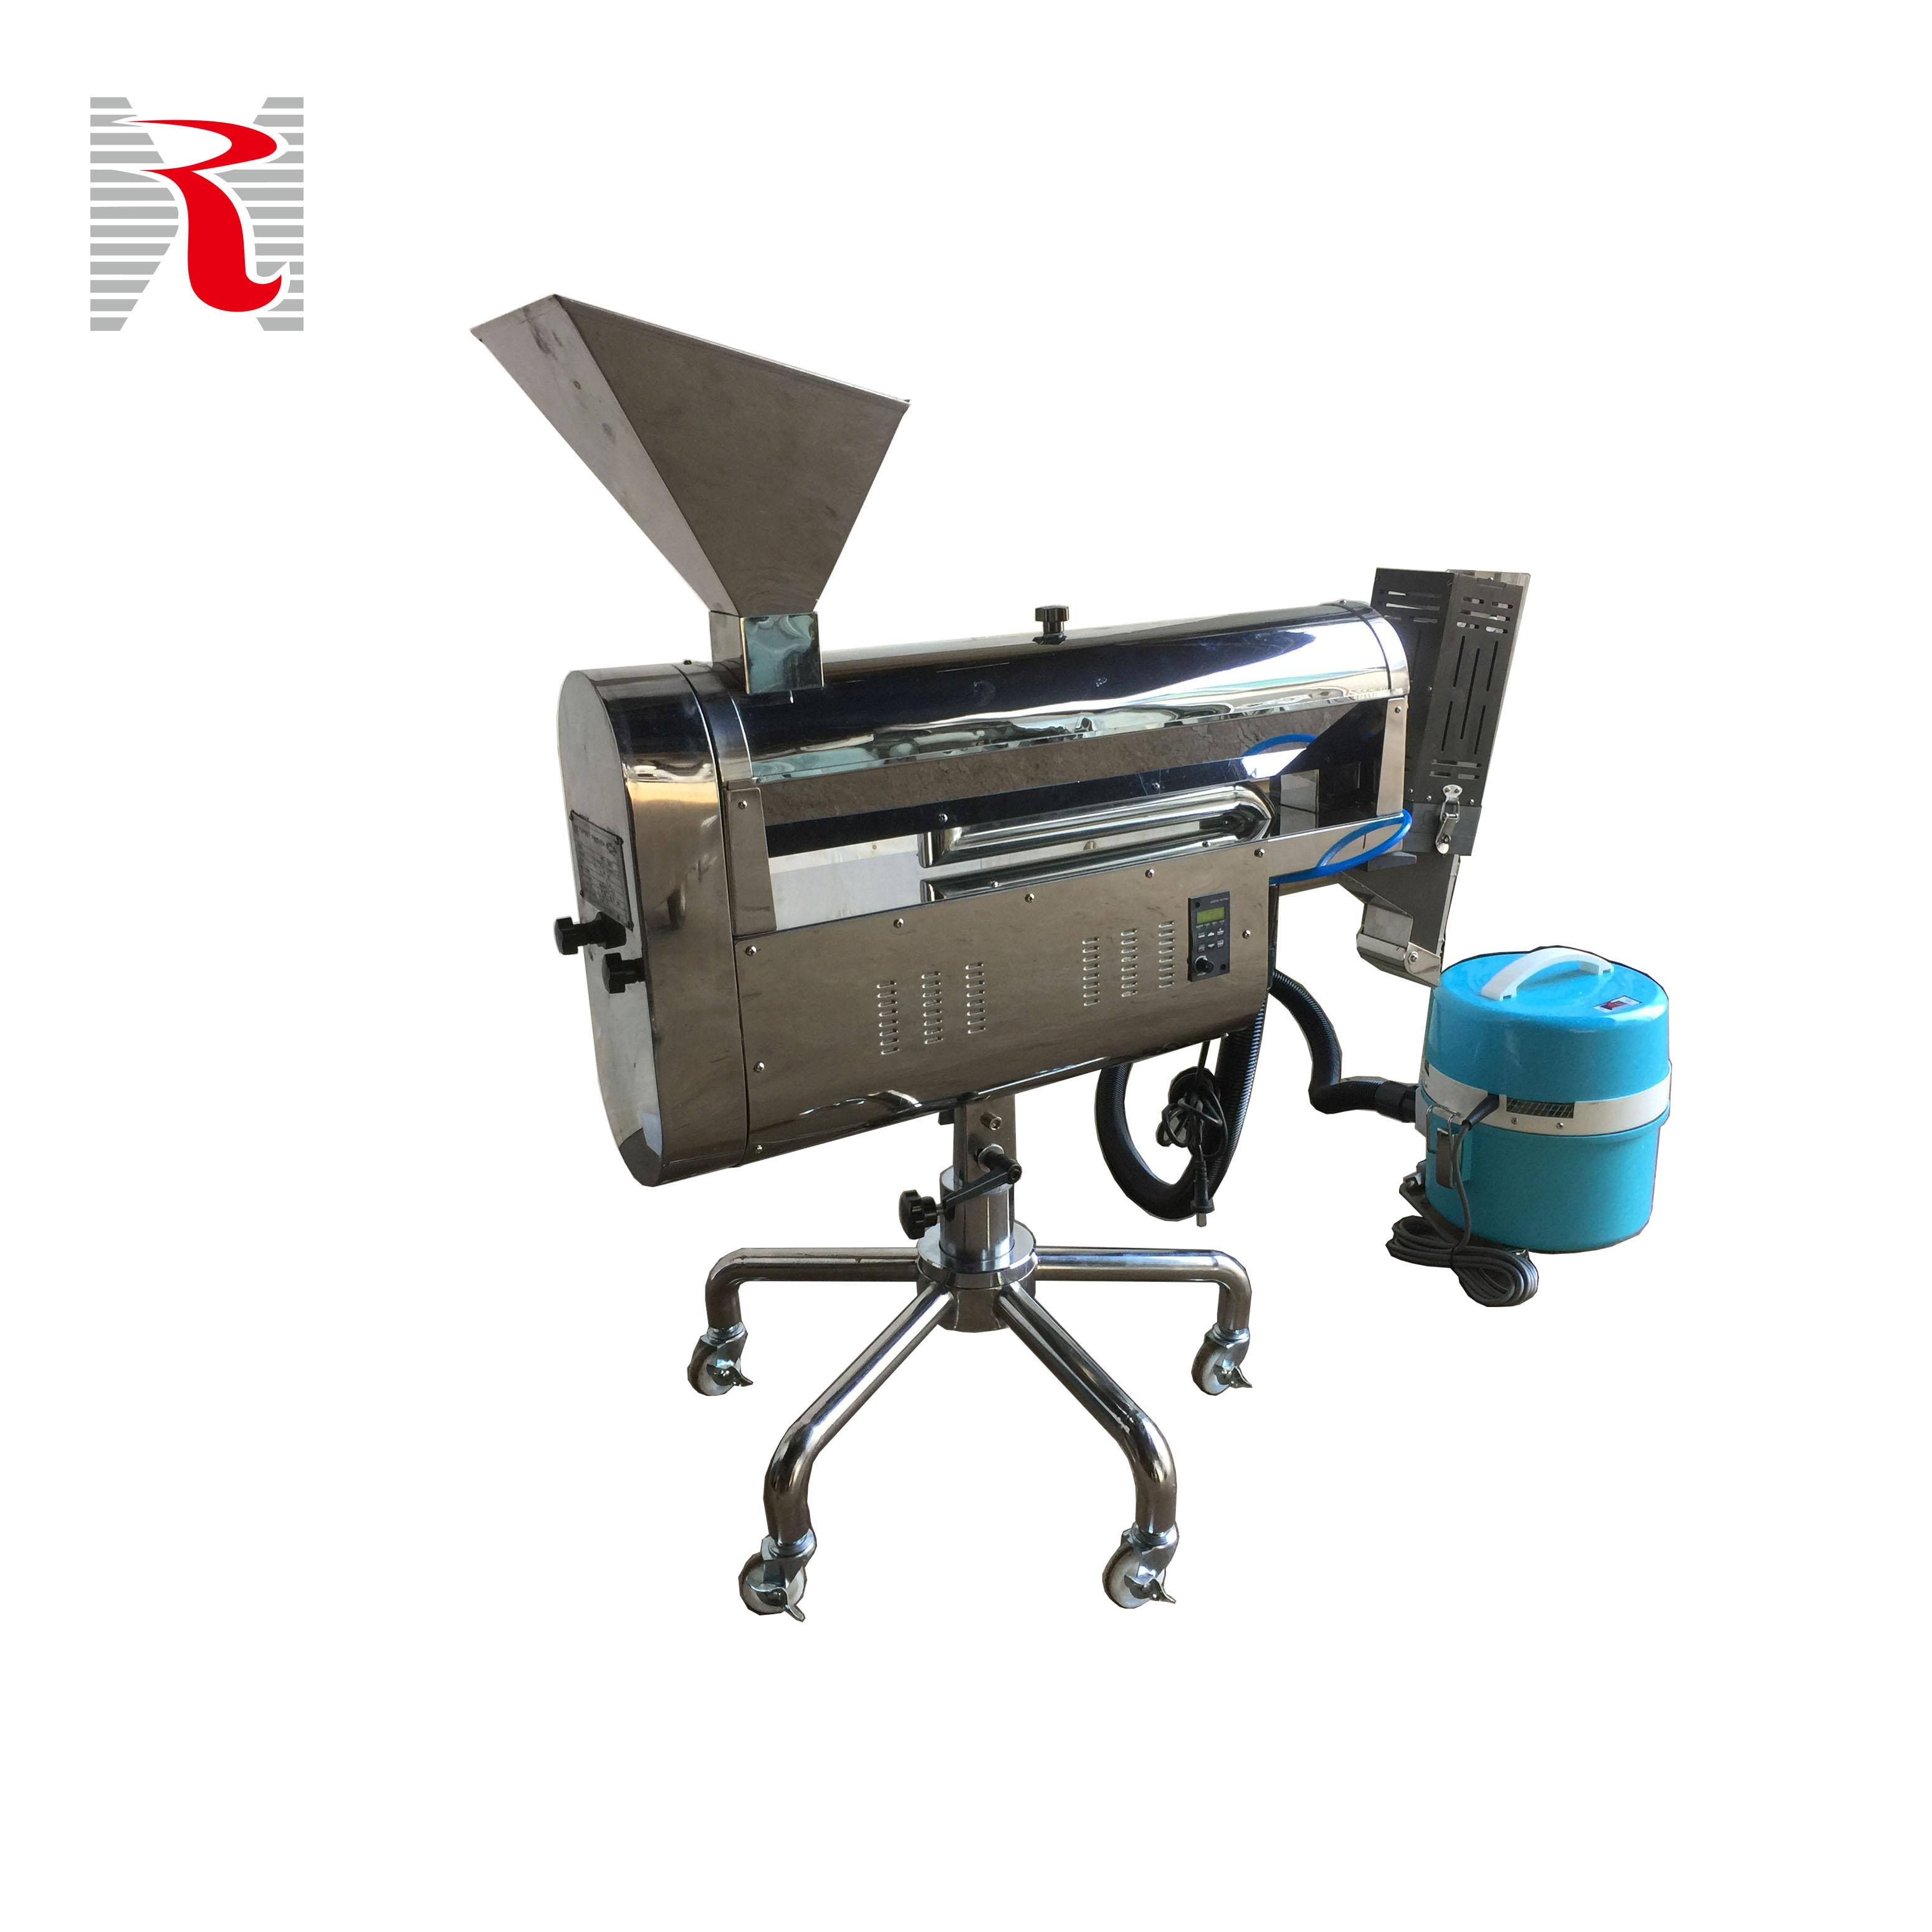 Professional Medicine Capsule Polishing Machine Polisher Capsule Sorter YPJ-GC